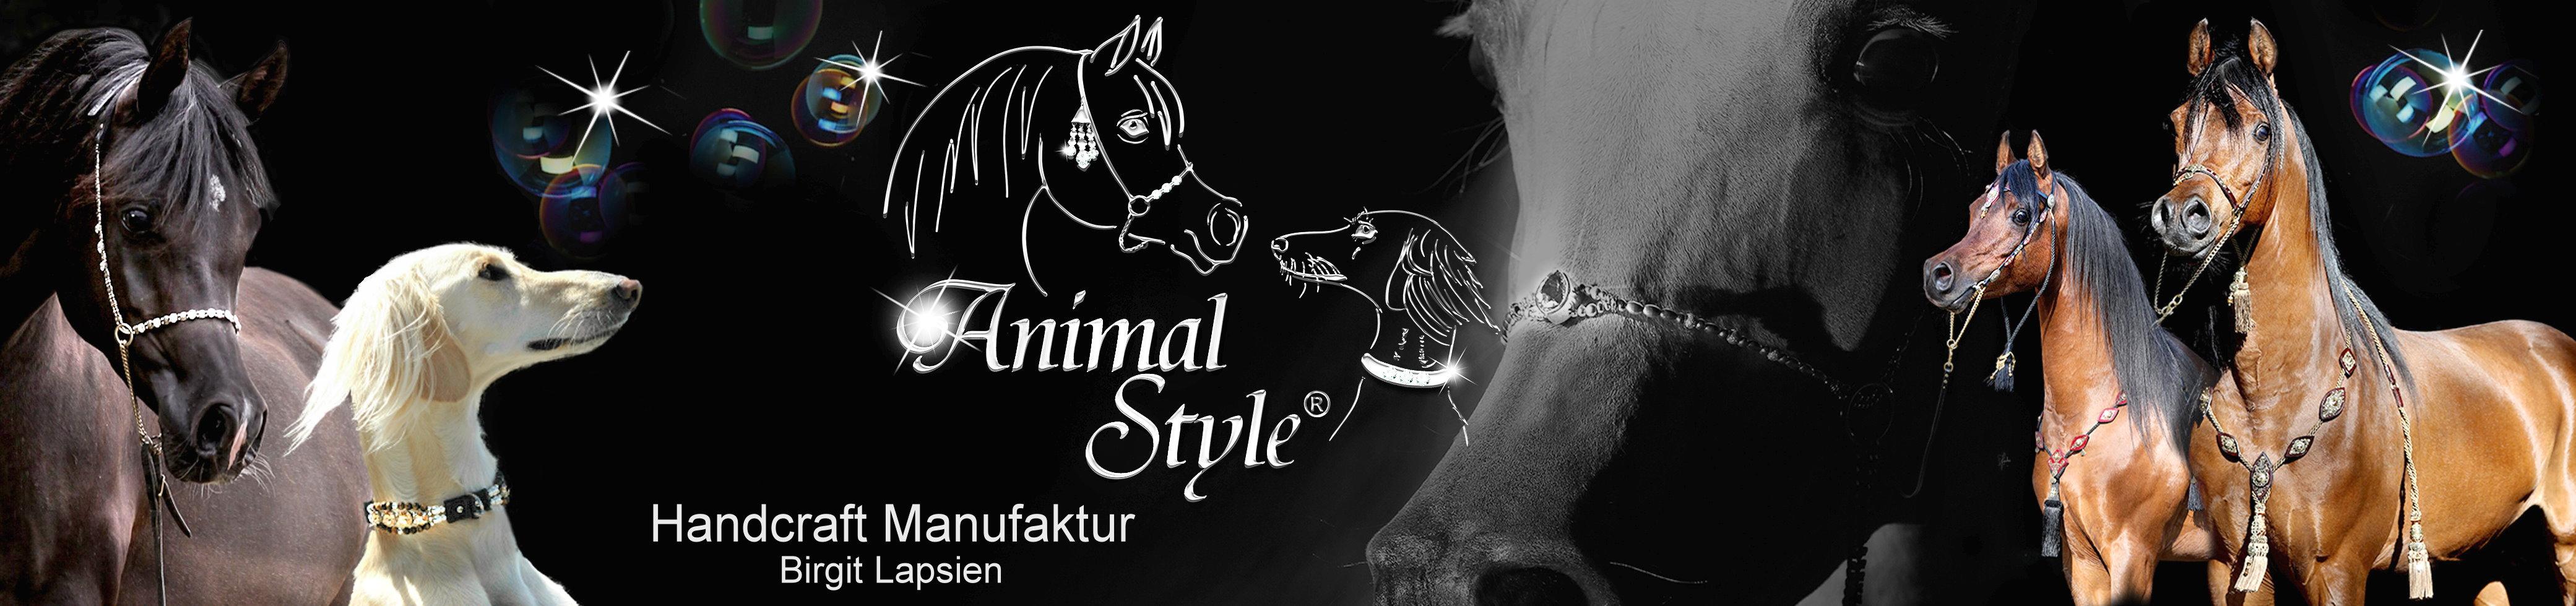 Animal Style®